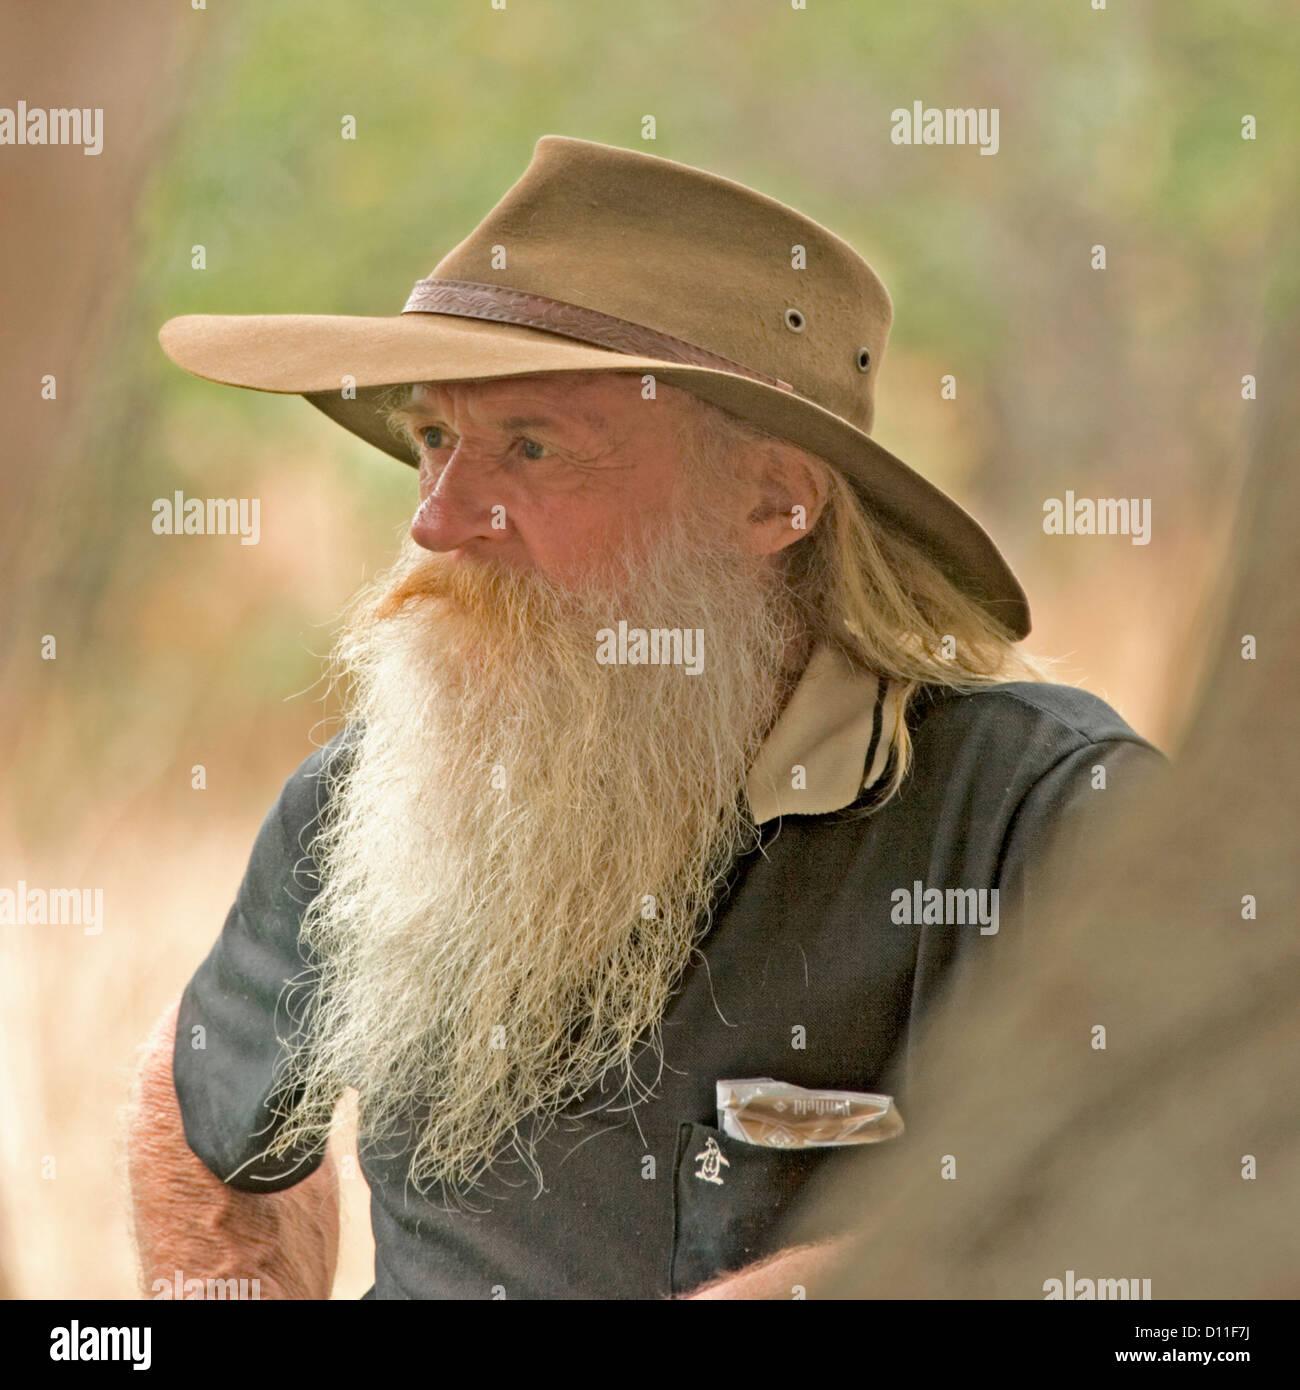 Bearded mature man unload